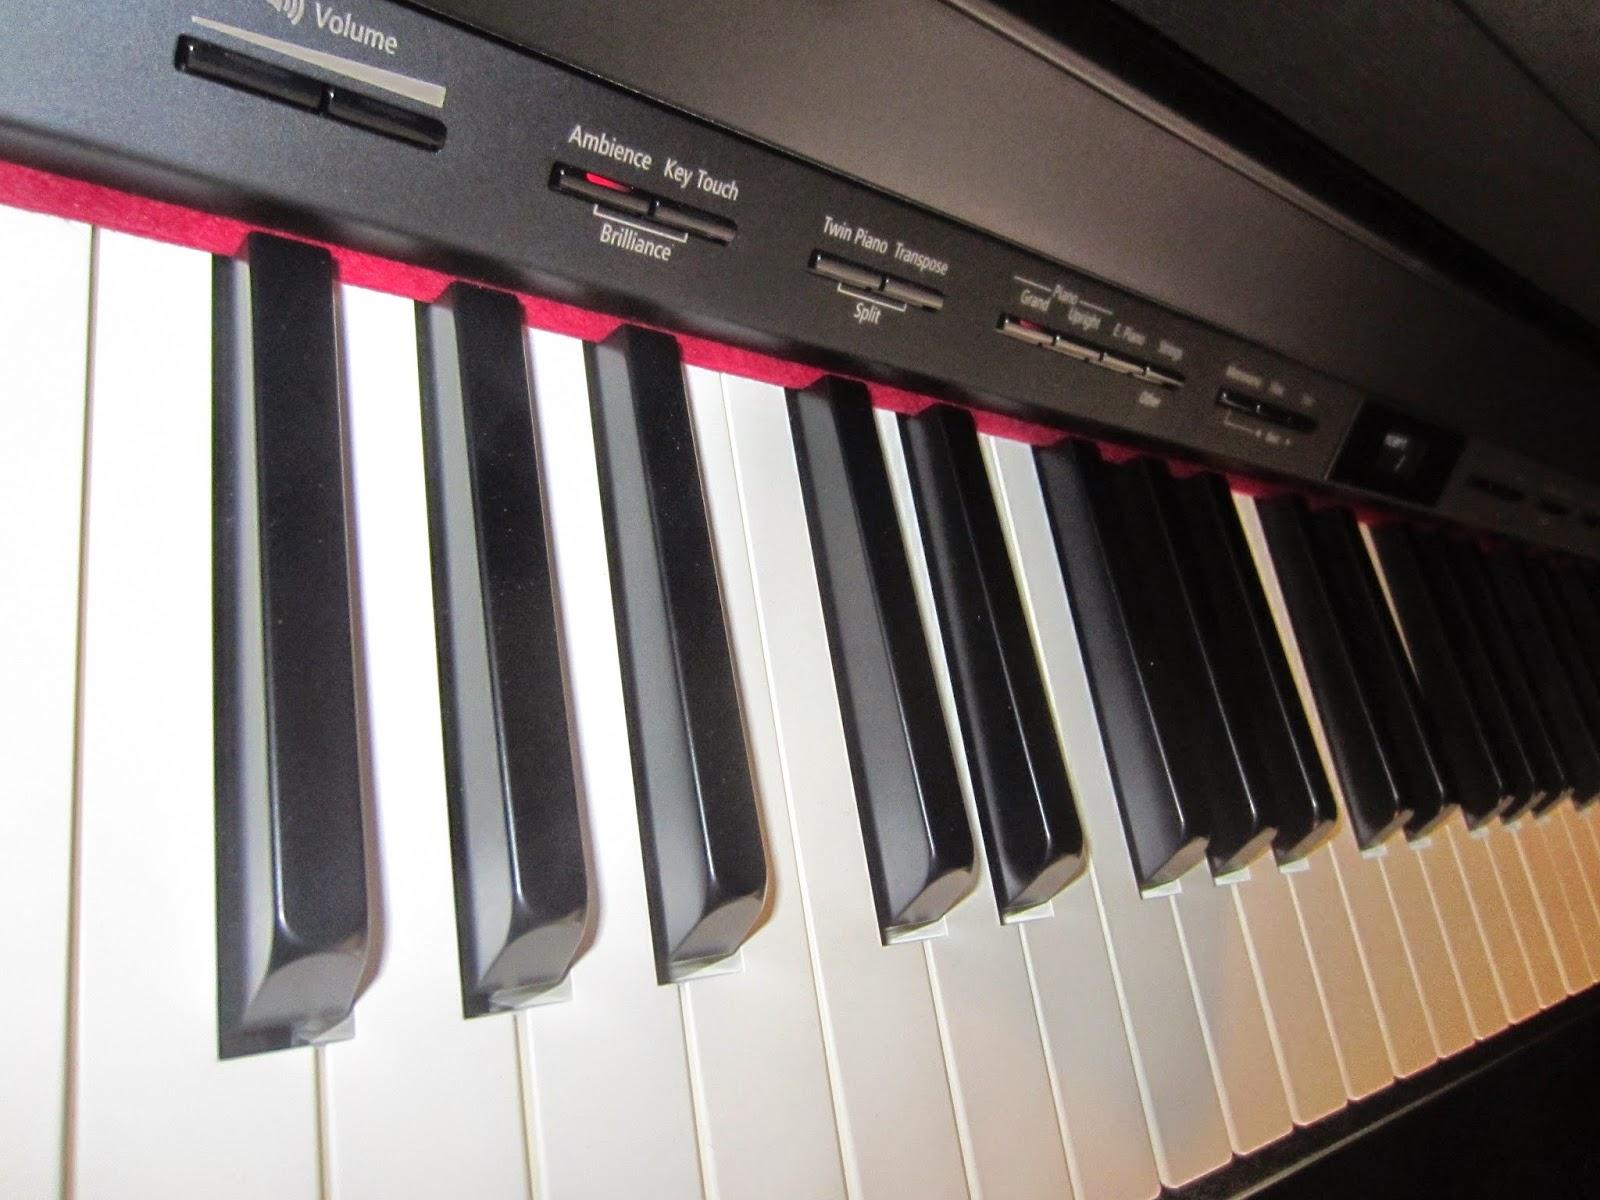 az piano reviews review roland hp504 hp506 hp508 digital pianos recommended impressive. Black Bedroom Furniture Sets. Home Design Ideas